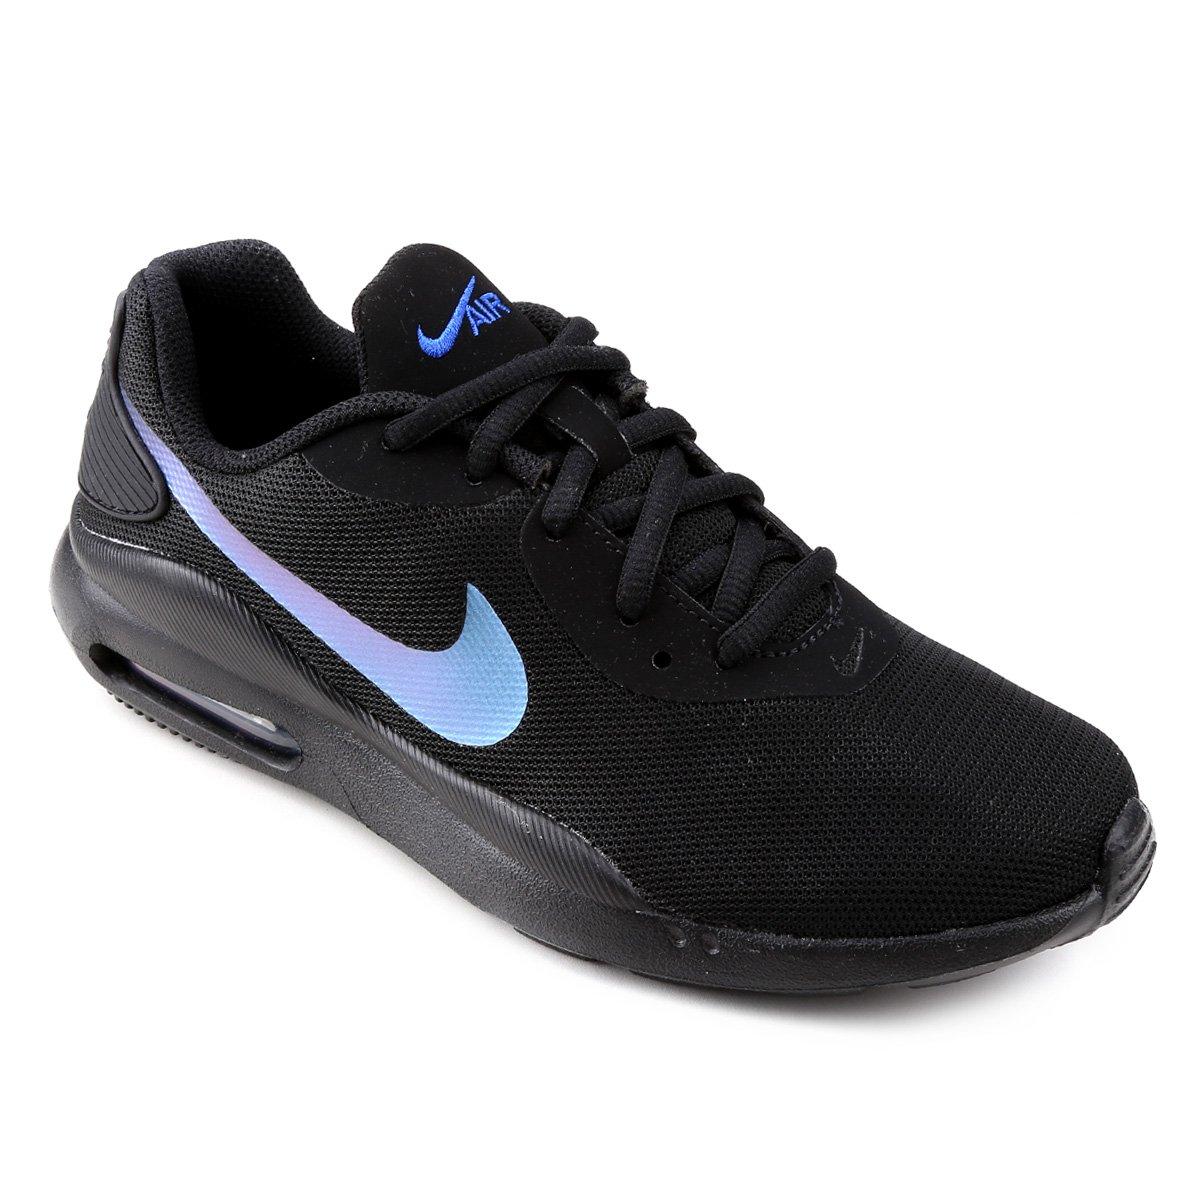 157b3fa36 Tênis Nike Air Max Oketo Feminino - Preto - Compre Agora